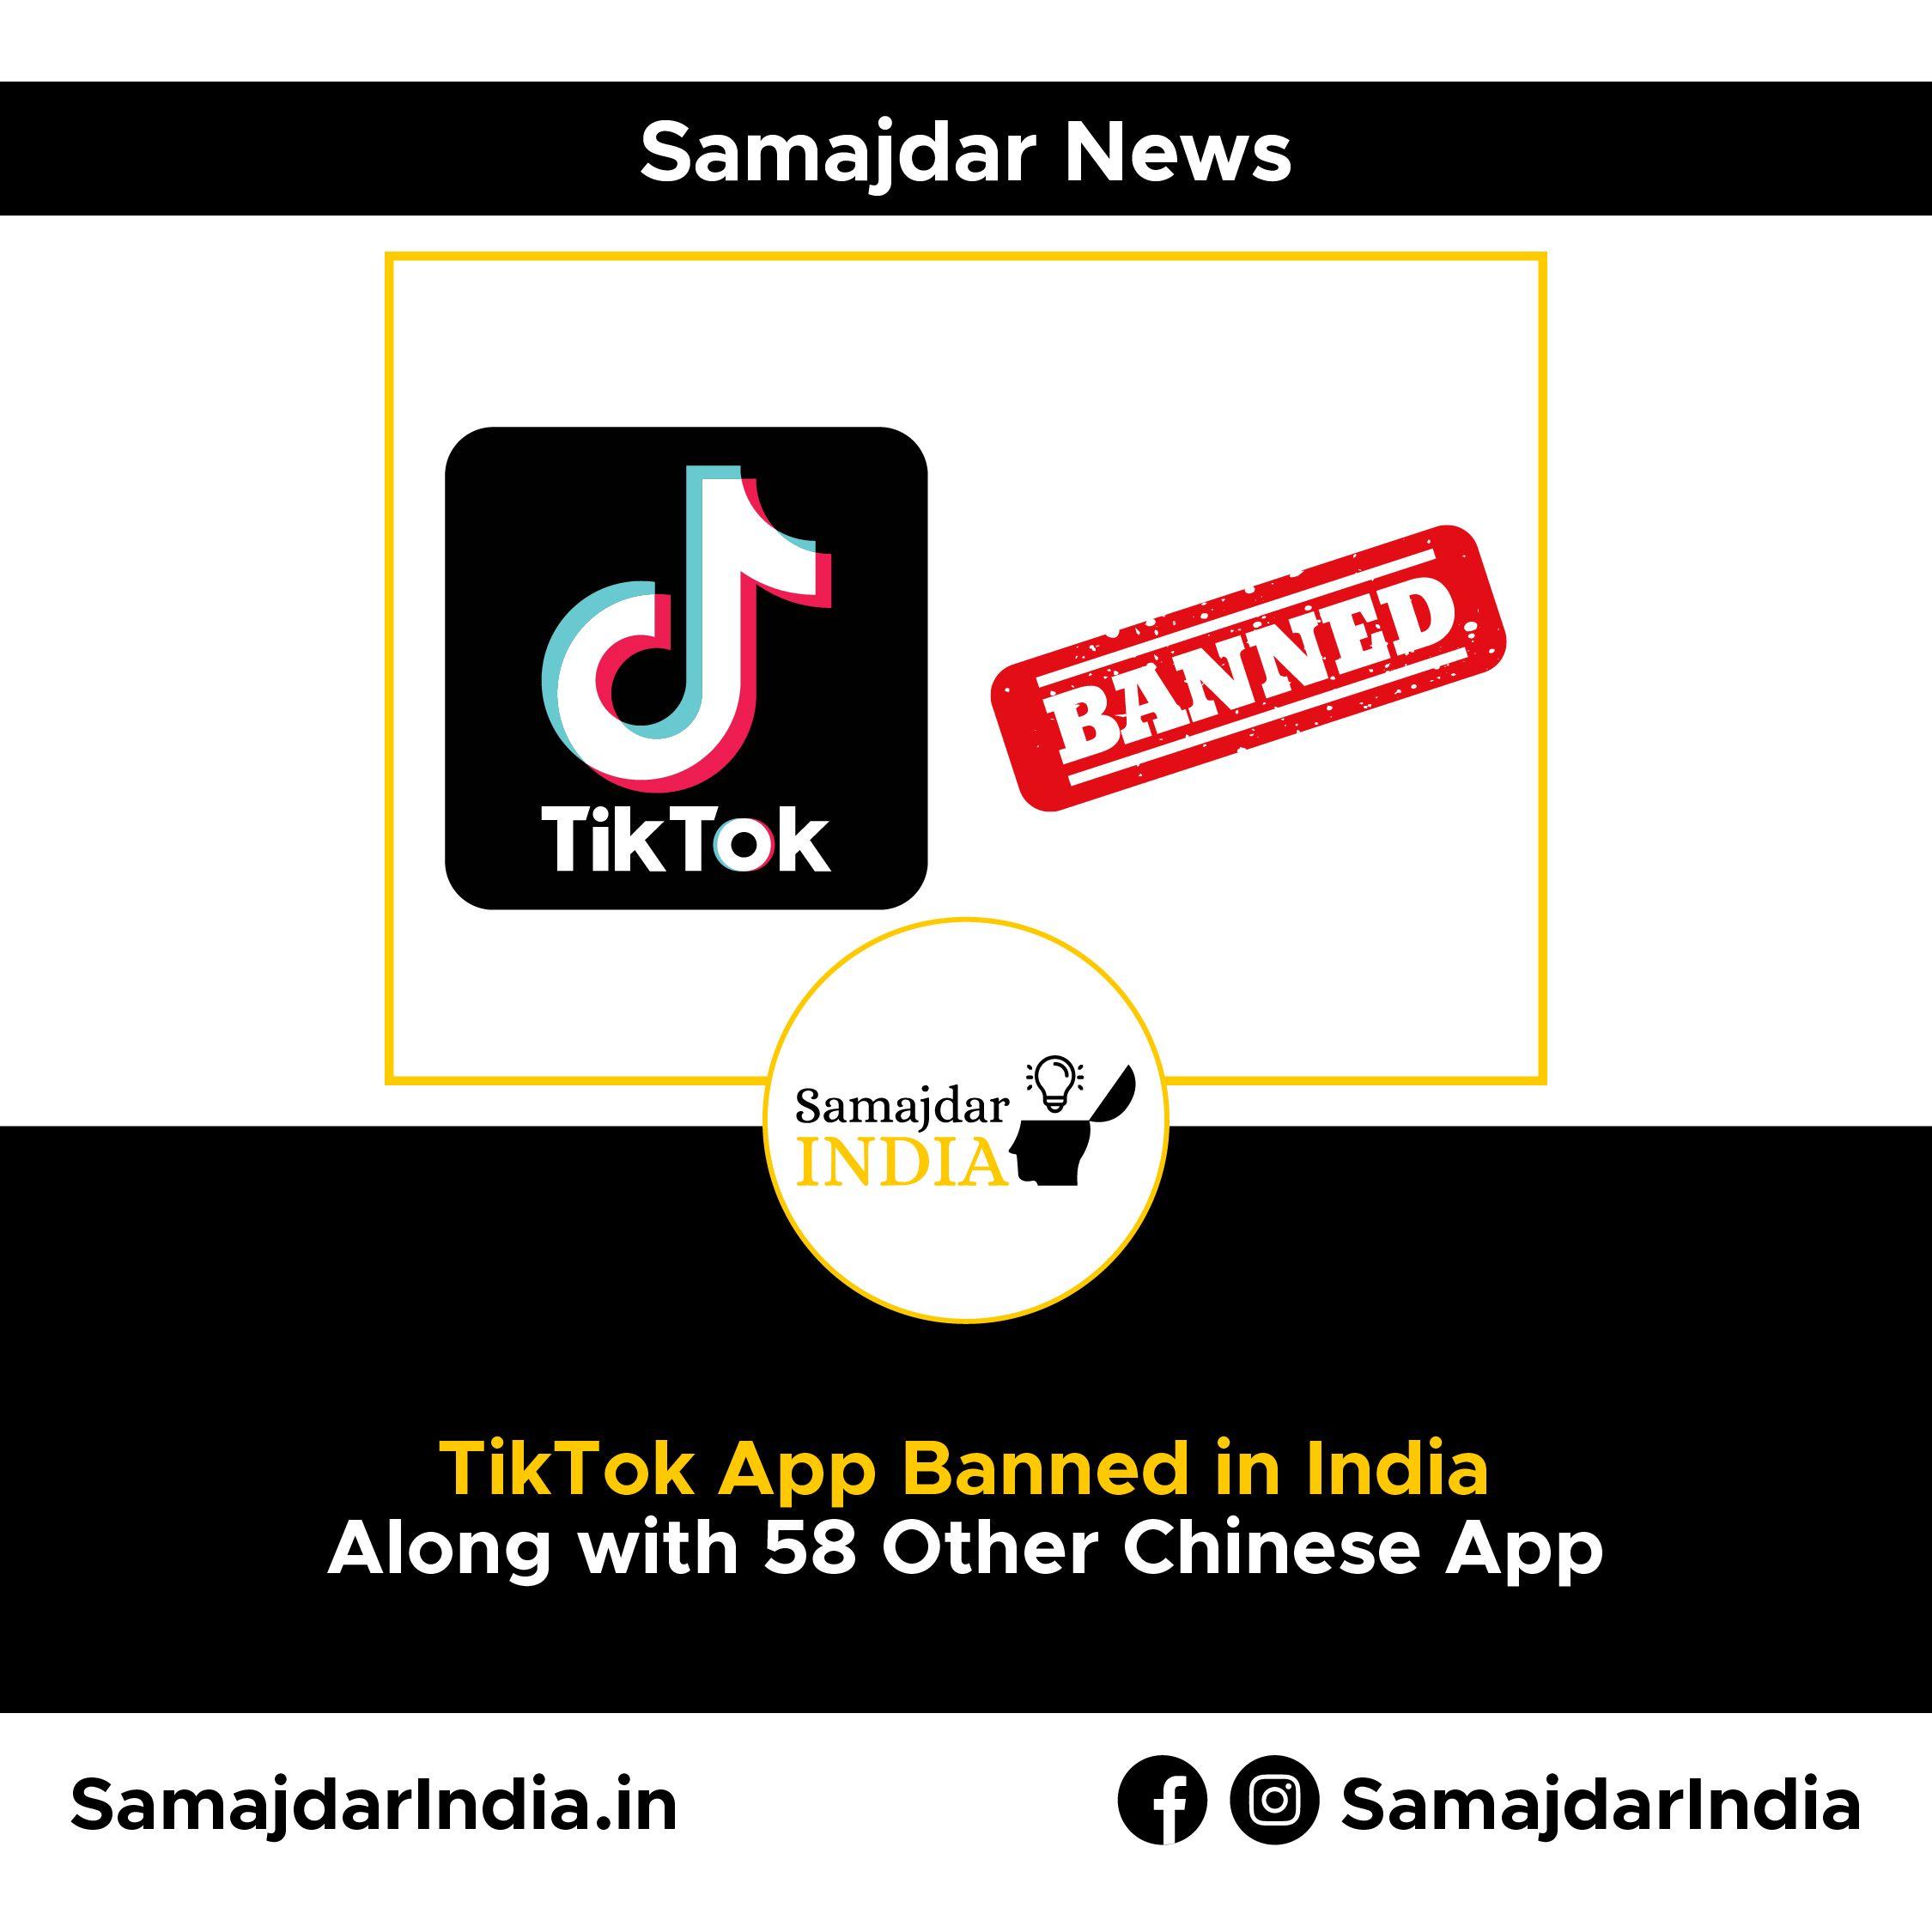 Tik Tok Banned Life Tech Company Logos Marketing